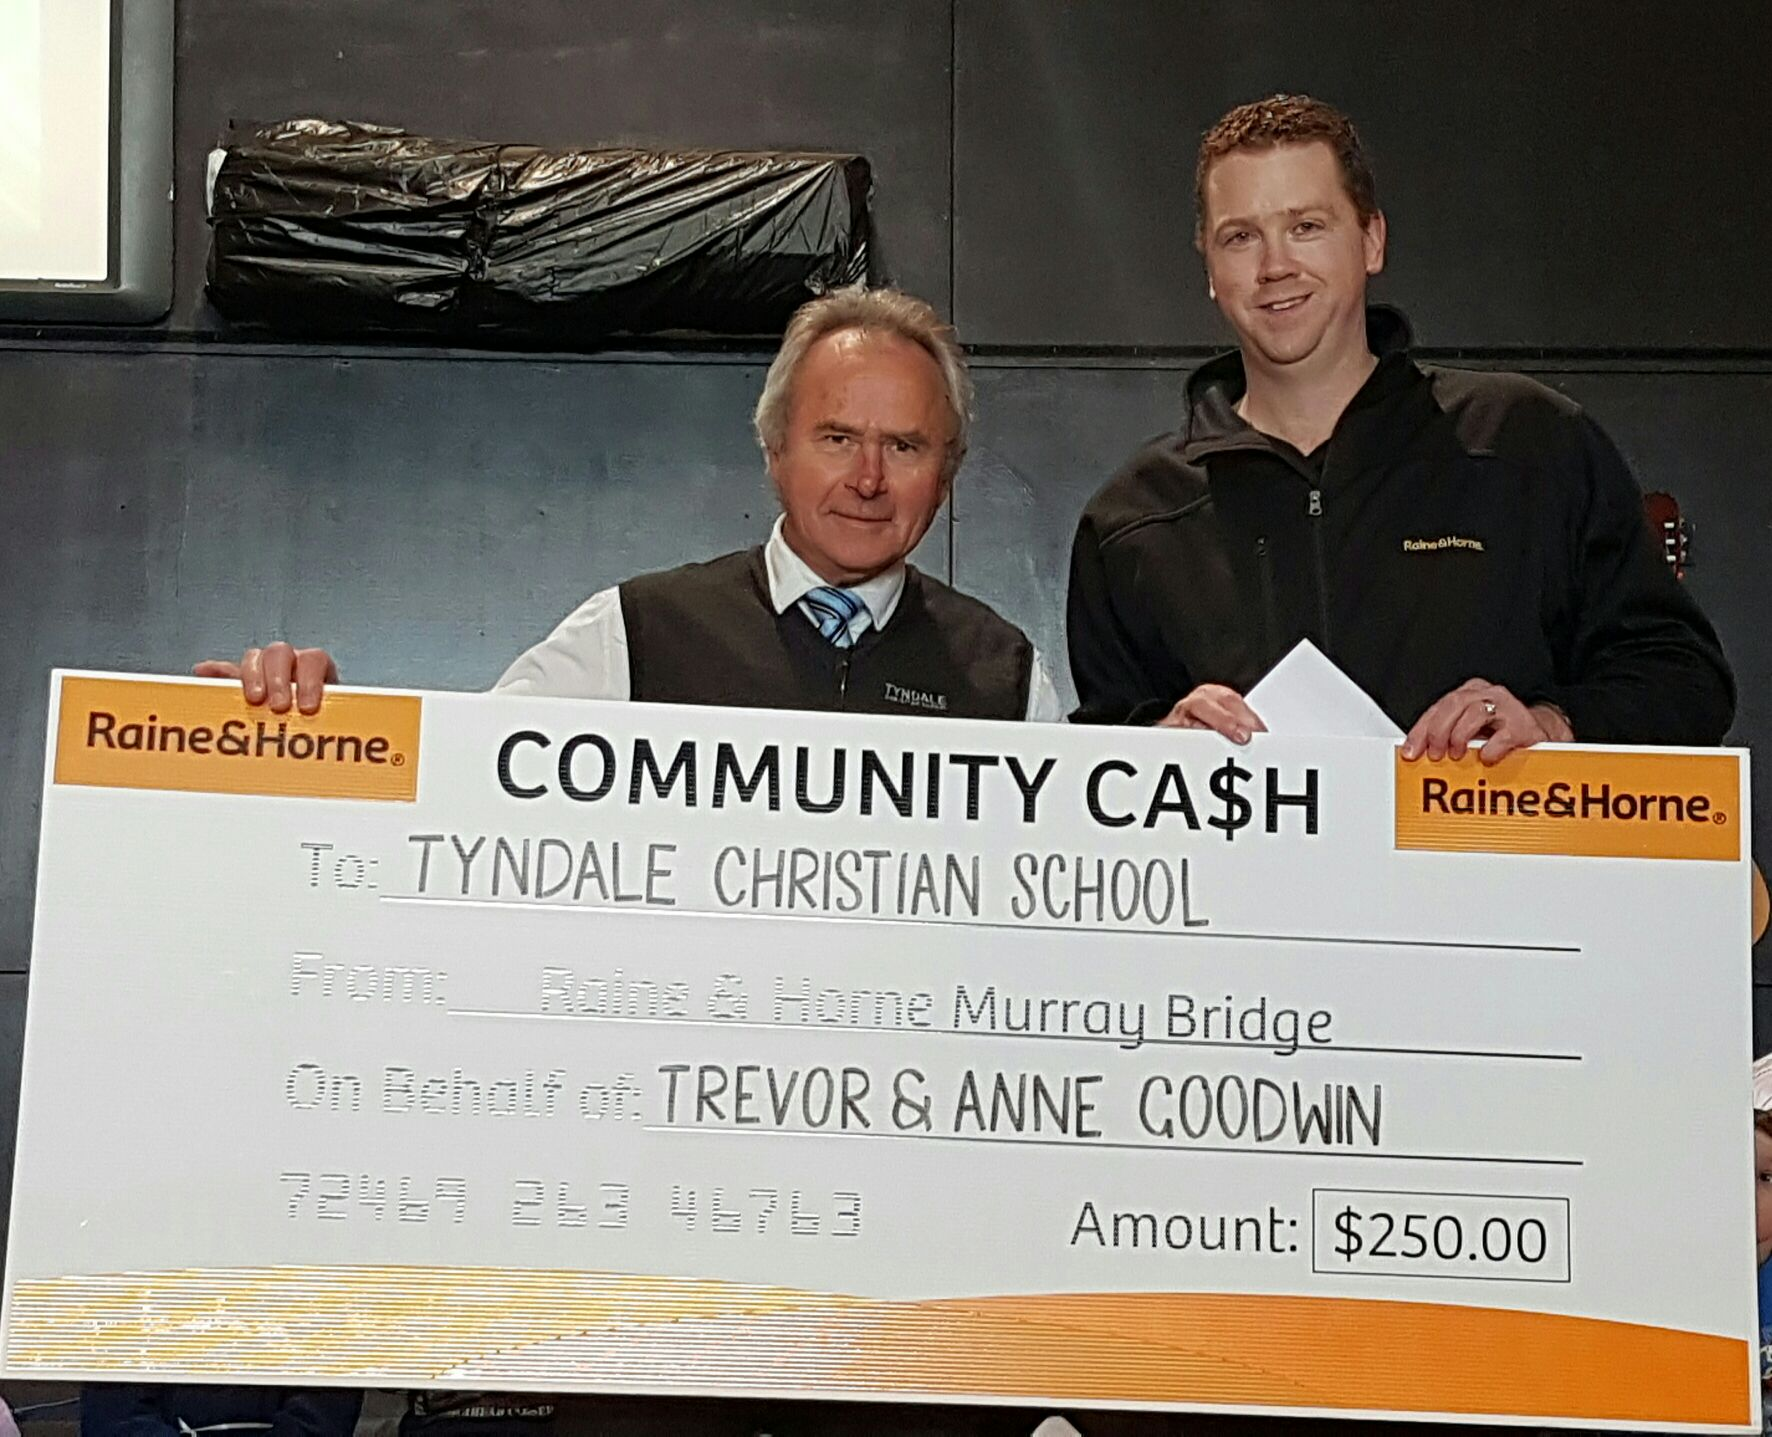 Tyndale Christian School - Community Cash